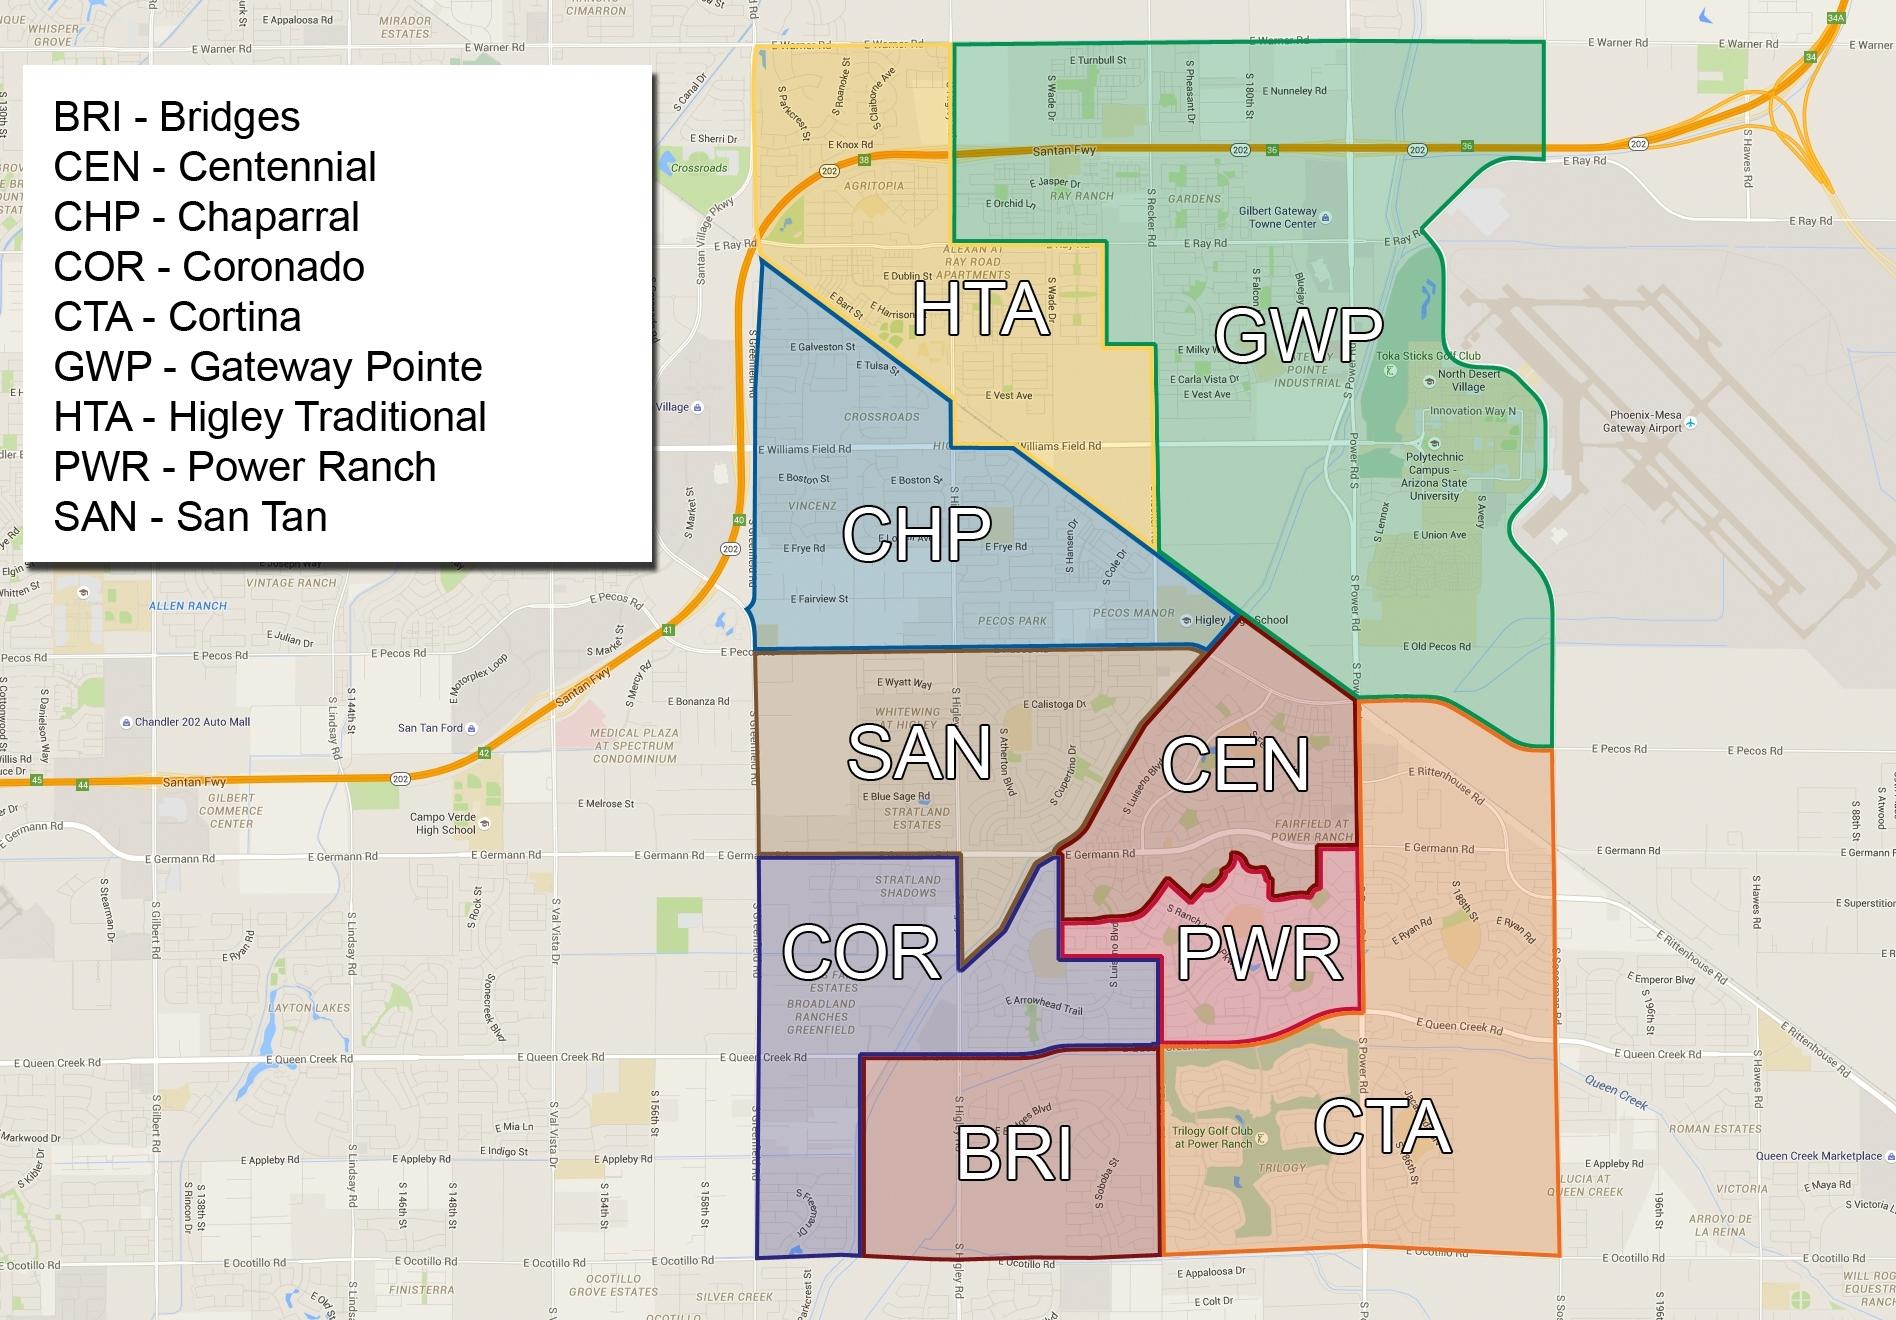 Higley Az Unified School District 2019 - 2020 School pertaining to School District Boundaries